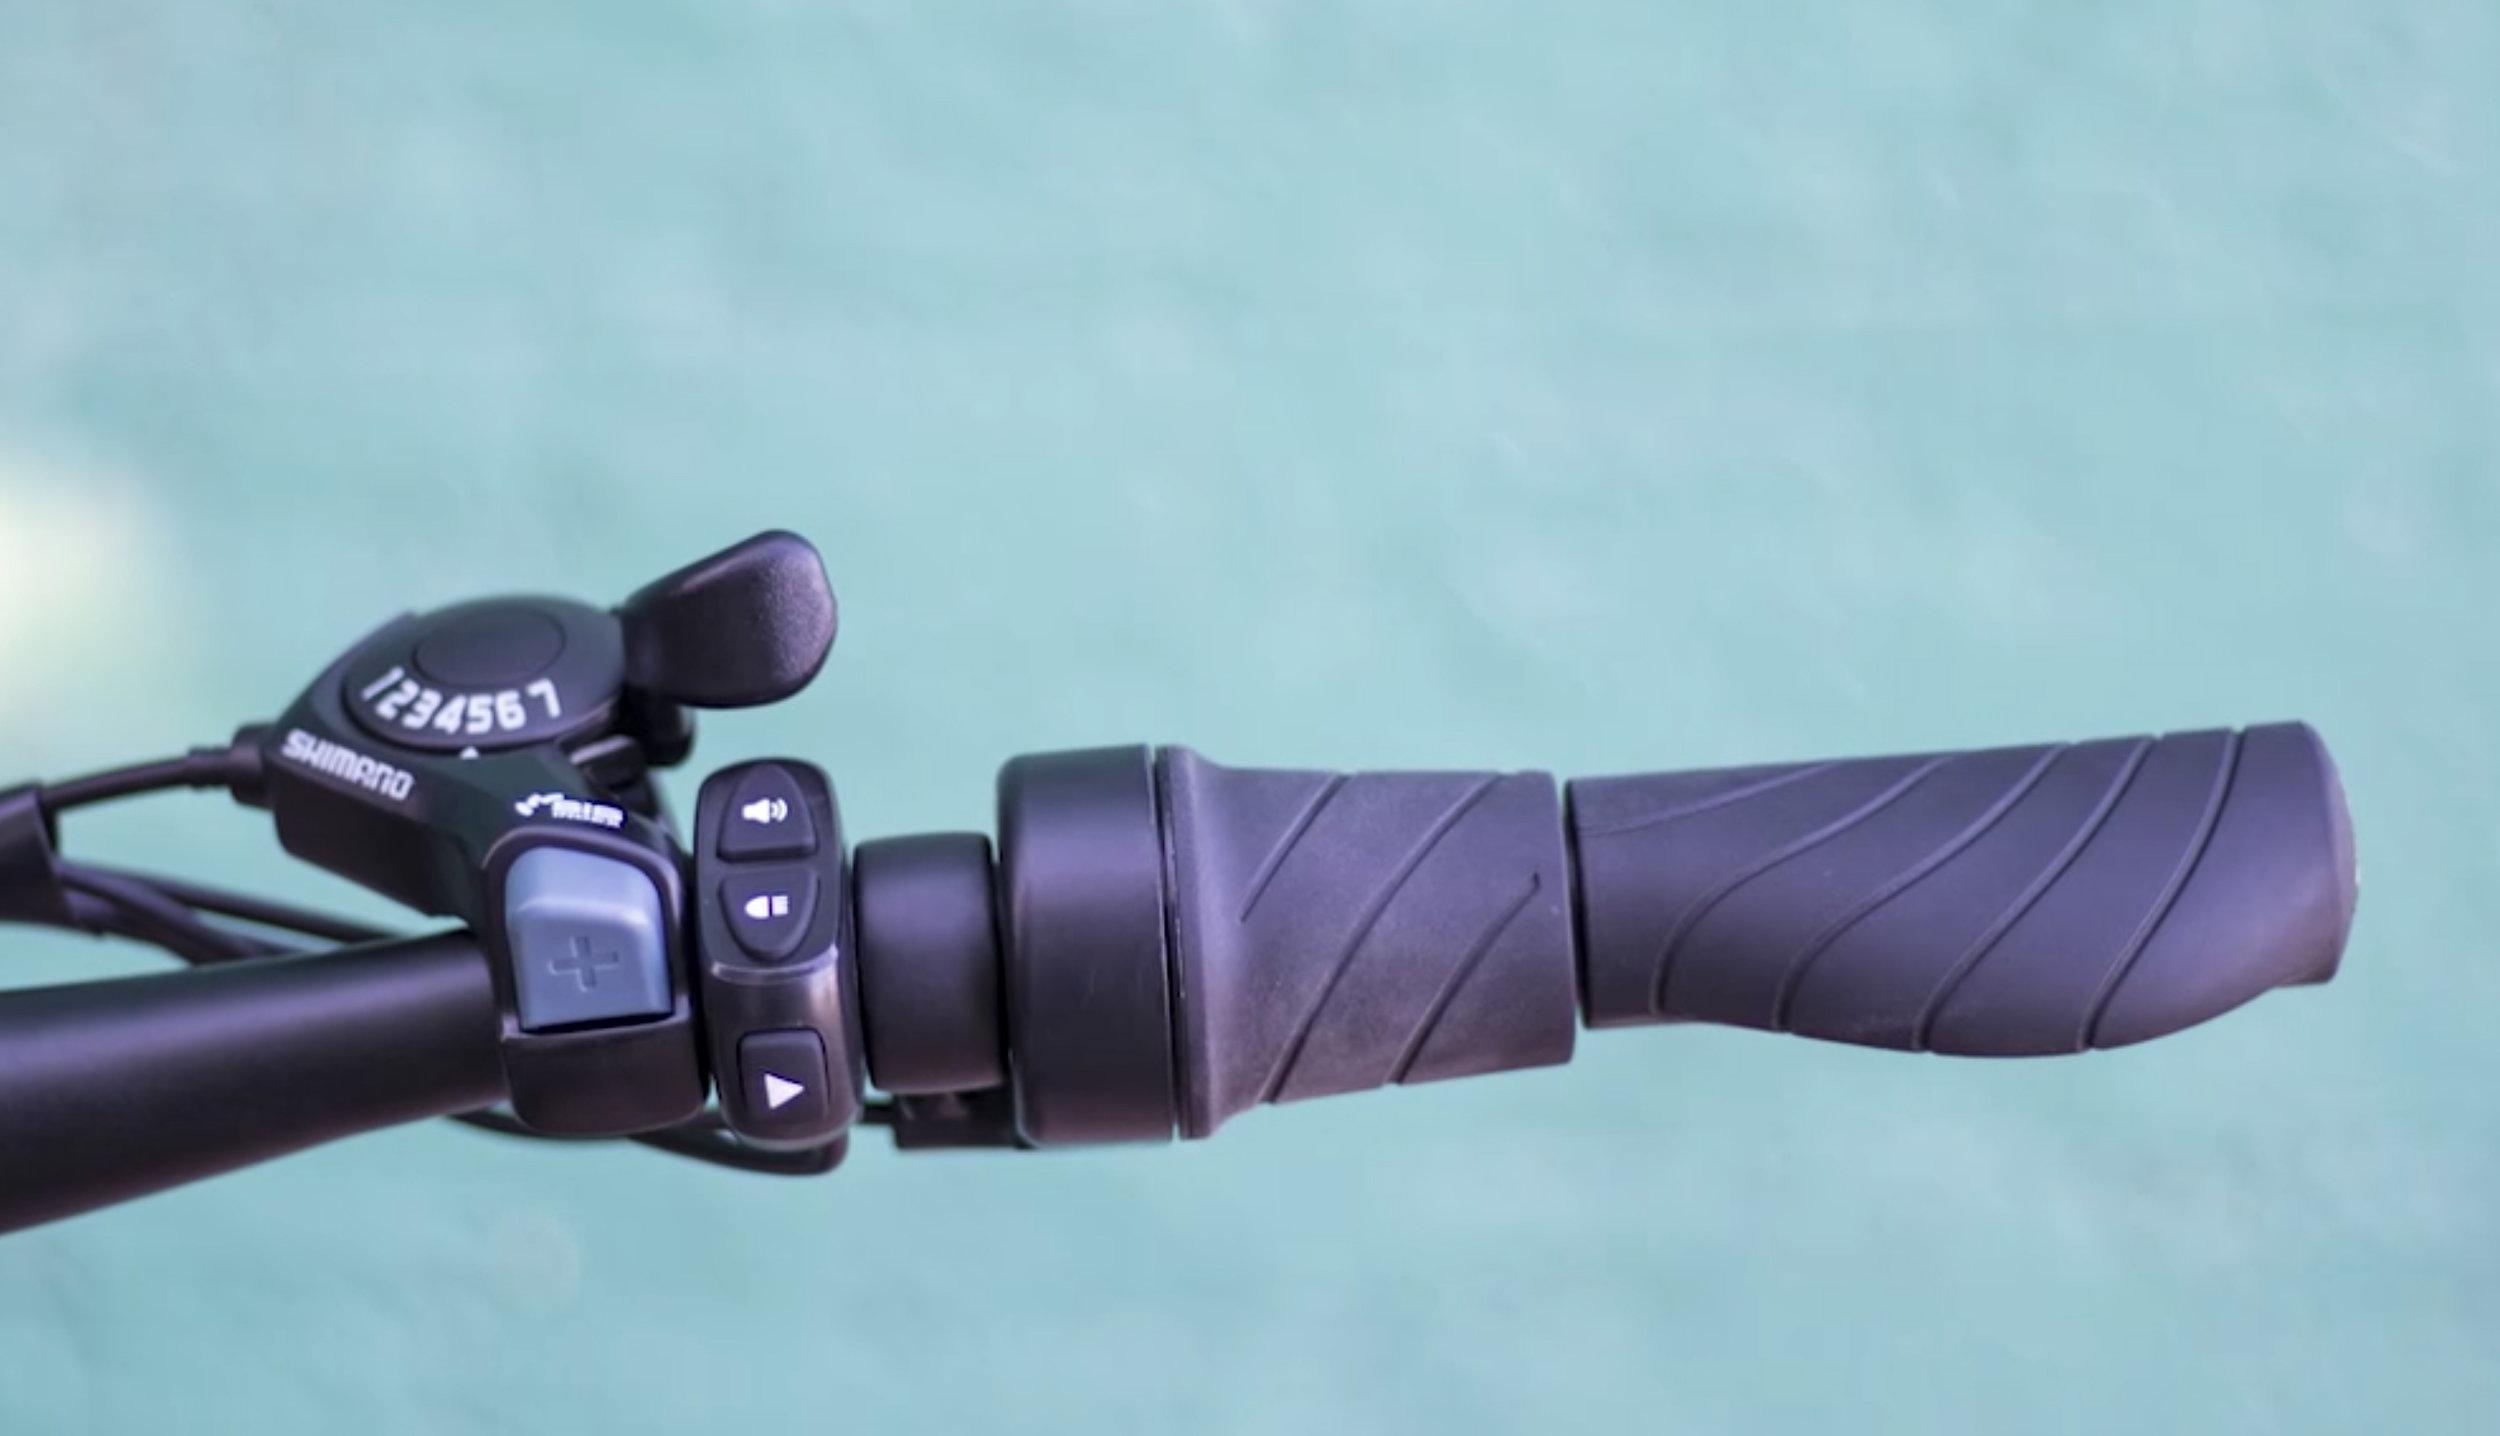 electrified-reviews-flash-v1-electric-bike-review-throttle.jpg